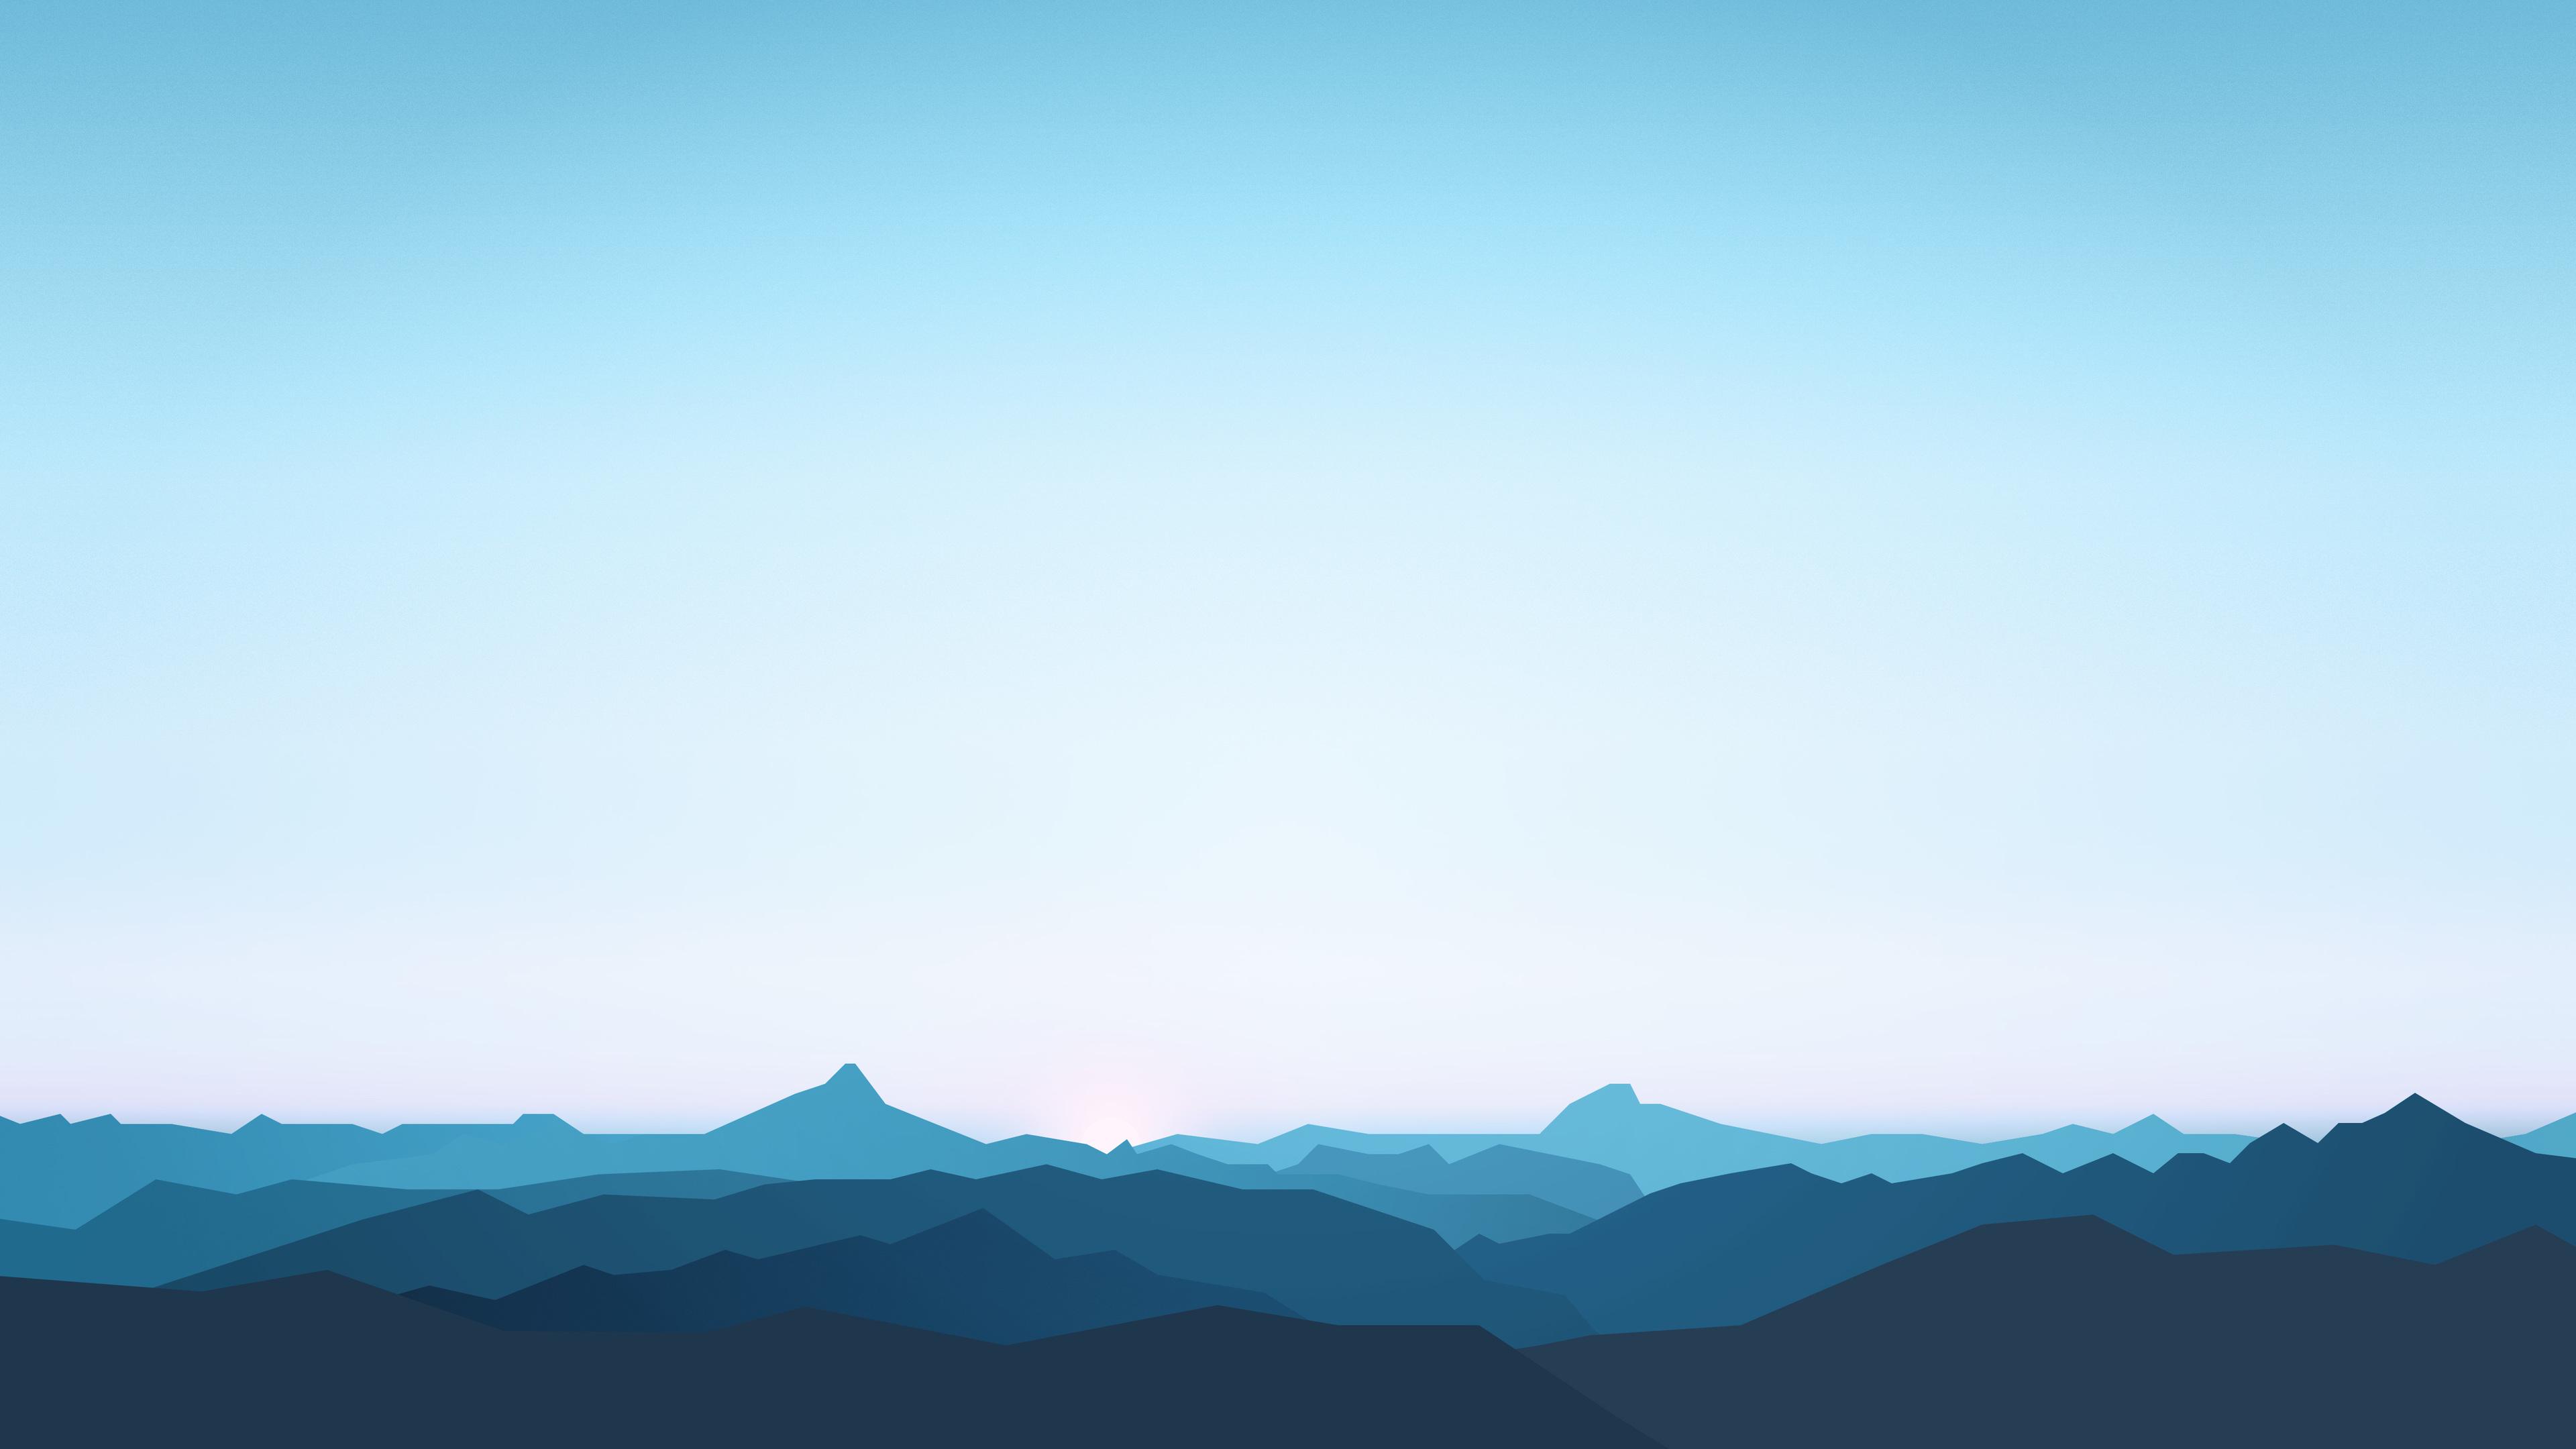 mountains landscape minimalism 4k 1540755074 - Mountains Landscape Minimalism 4k - mountains wallpapers, minimalism wallpapers, landscape wallpapers, hd-wallpapers, digital art wallpapers, artwork wallpapers, artist wallpapers, 4k-wallpapers